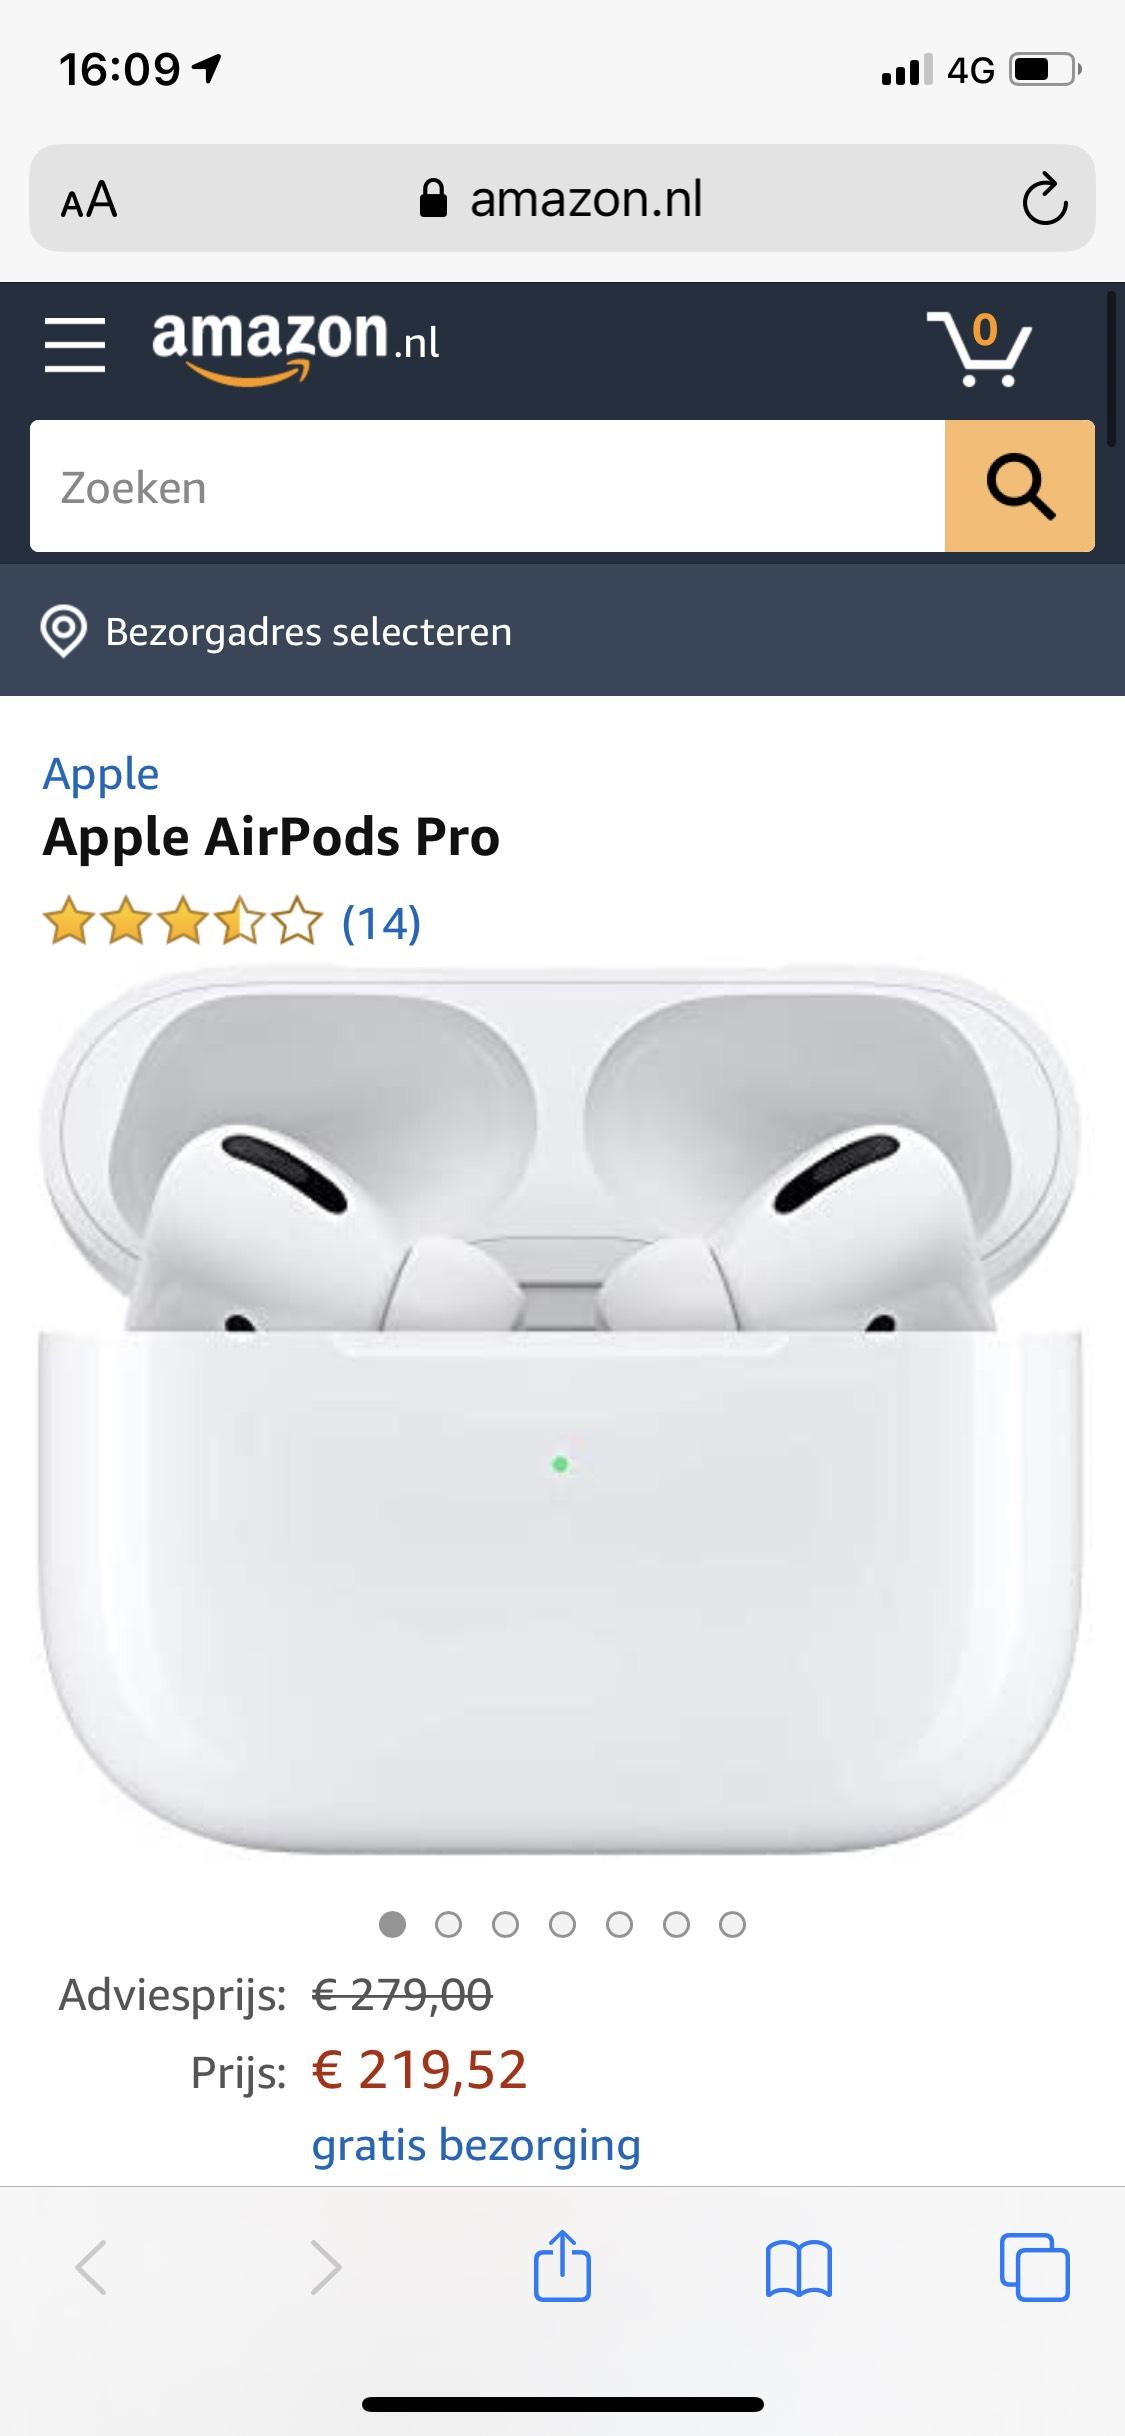 Apple AirPods Pro @Amazon.nl